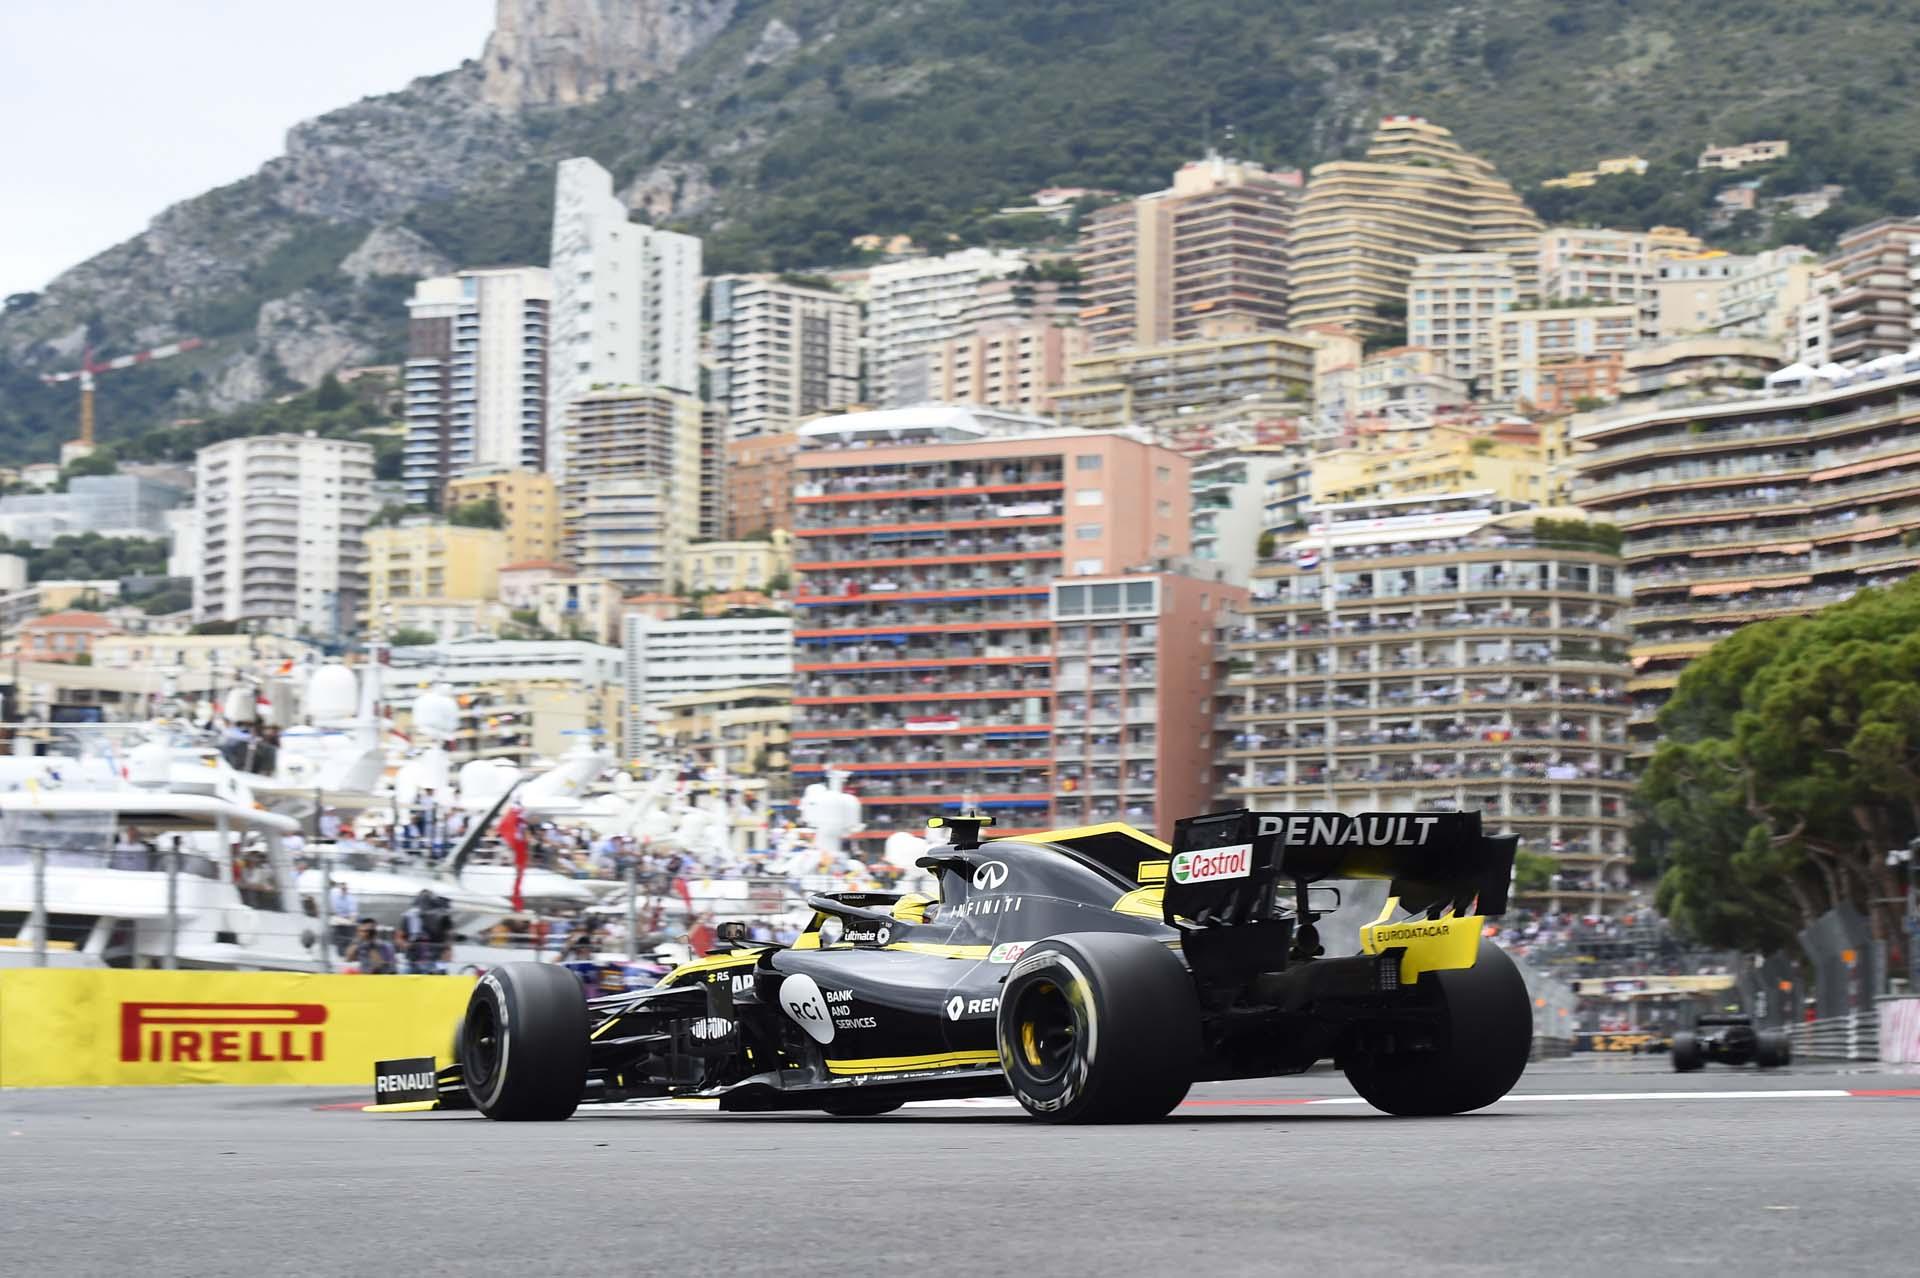 MonacoGP2019_SUN_Pirelli_monacosunday14-538757